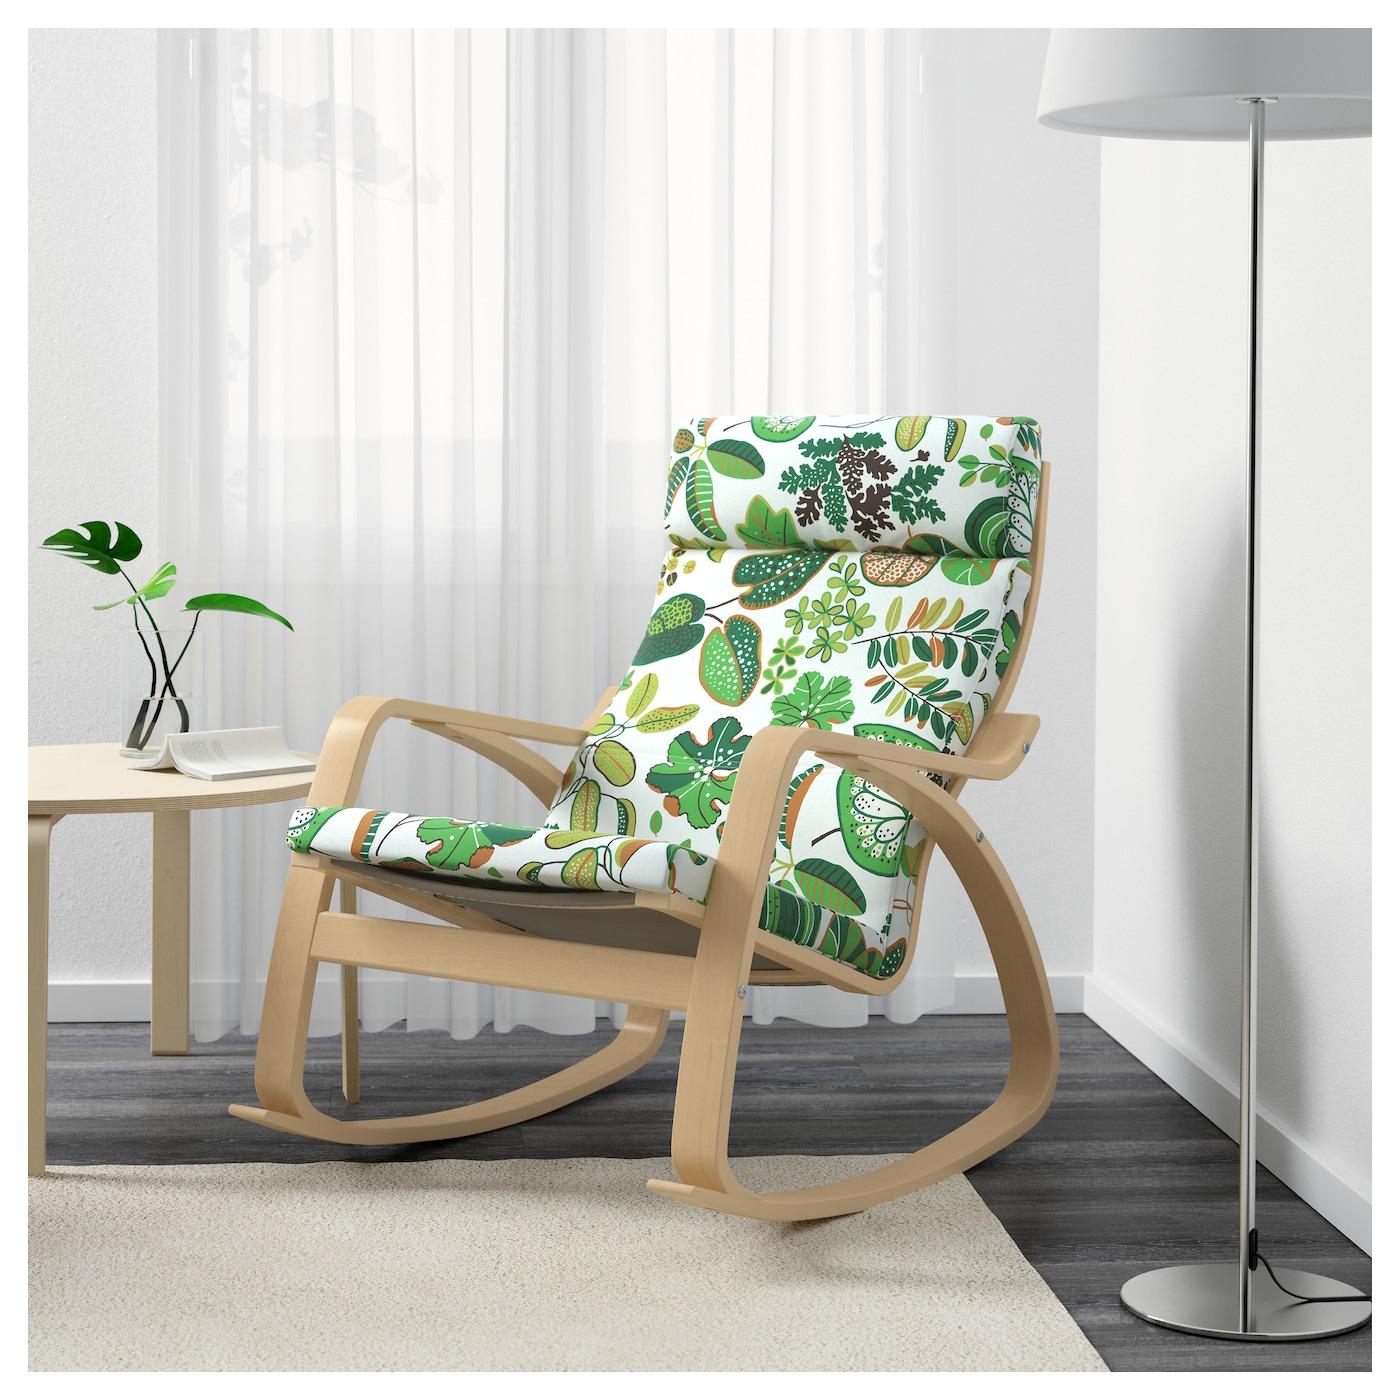 po ng rocking chair birch veneer simmarp green ikea. Black Bedroom Furniture Sets. Home Design Ideas